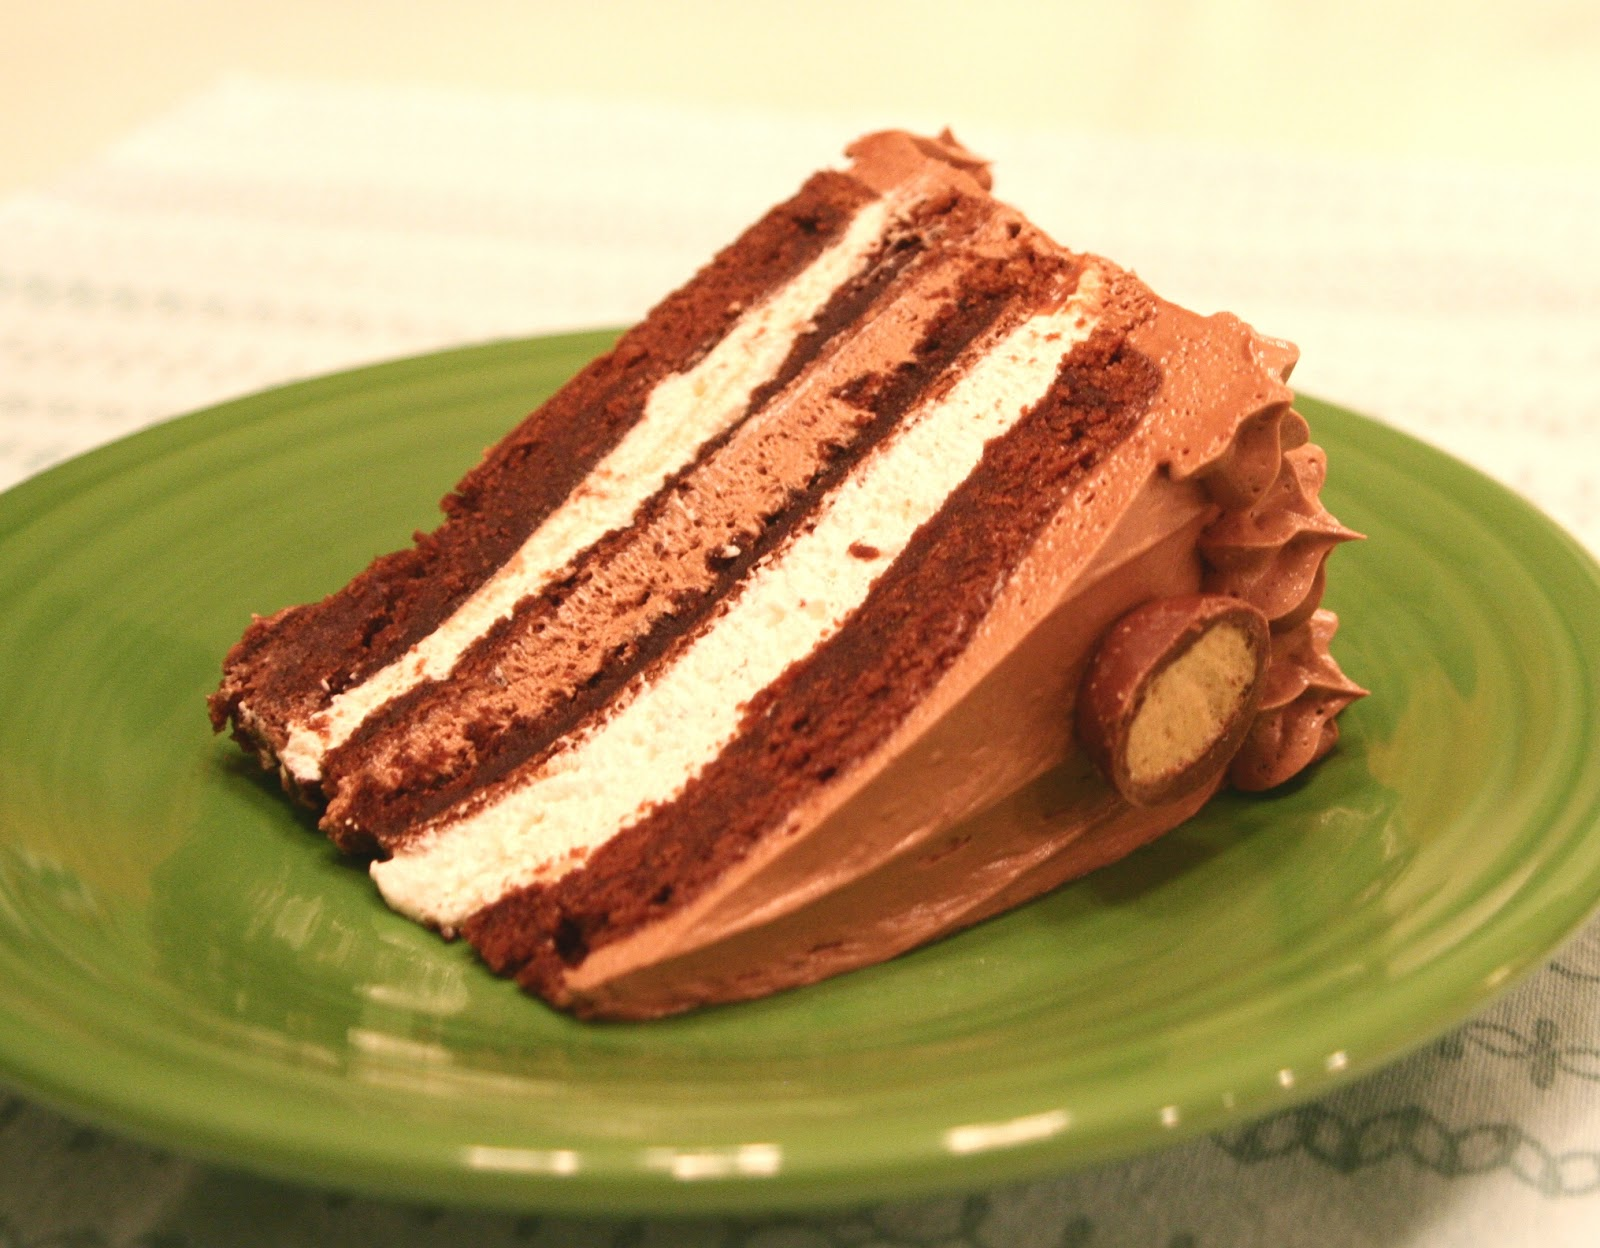 Cooking in Kirkland: Marshmallow & Malt Chocolate Cake